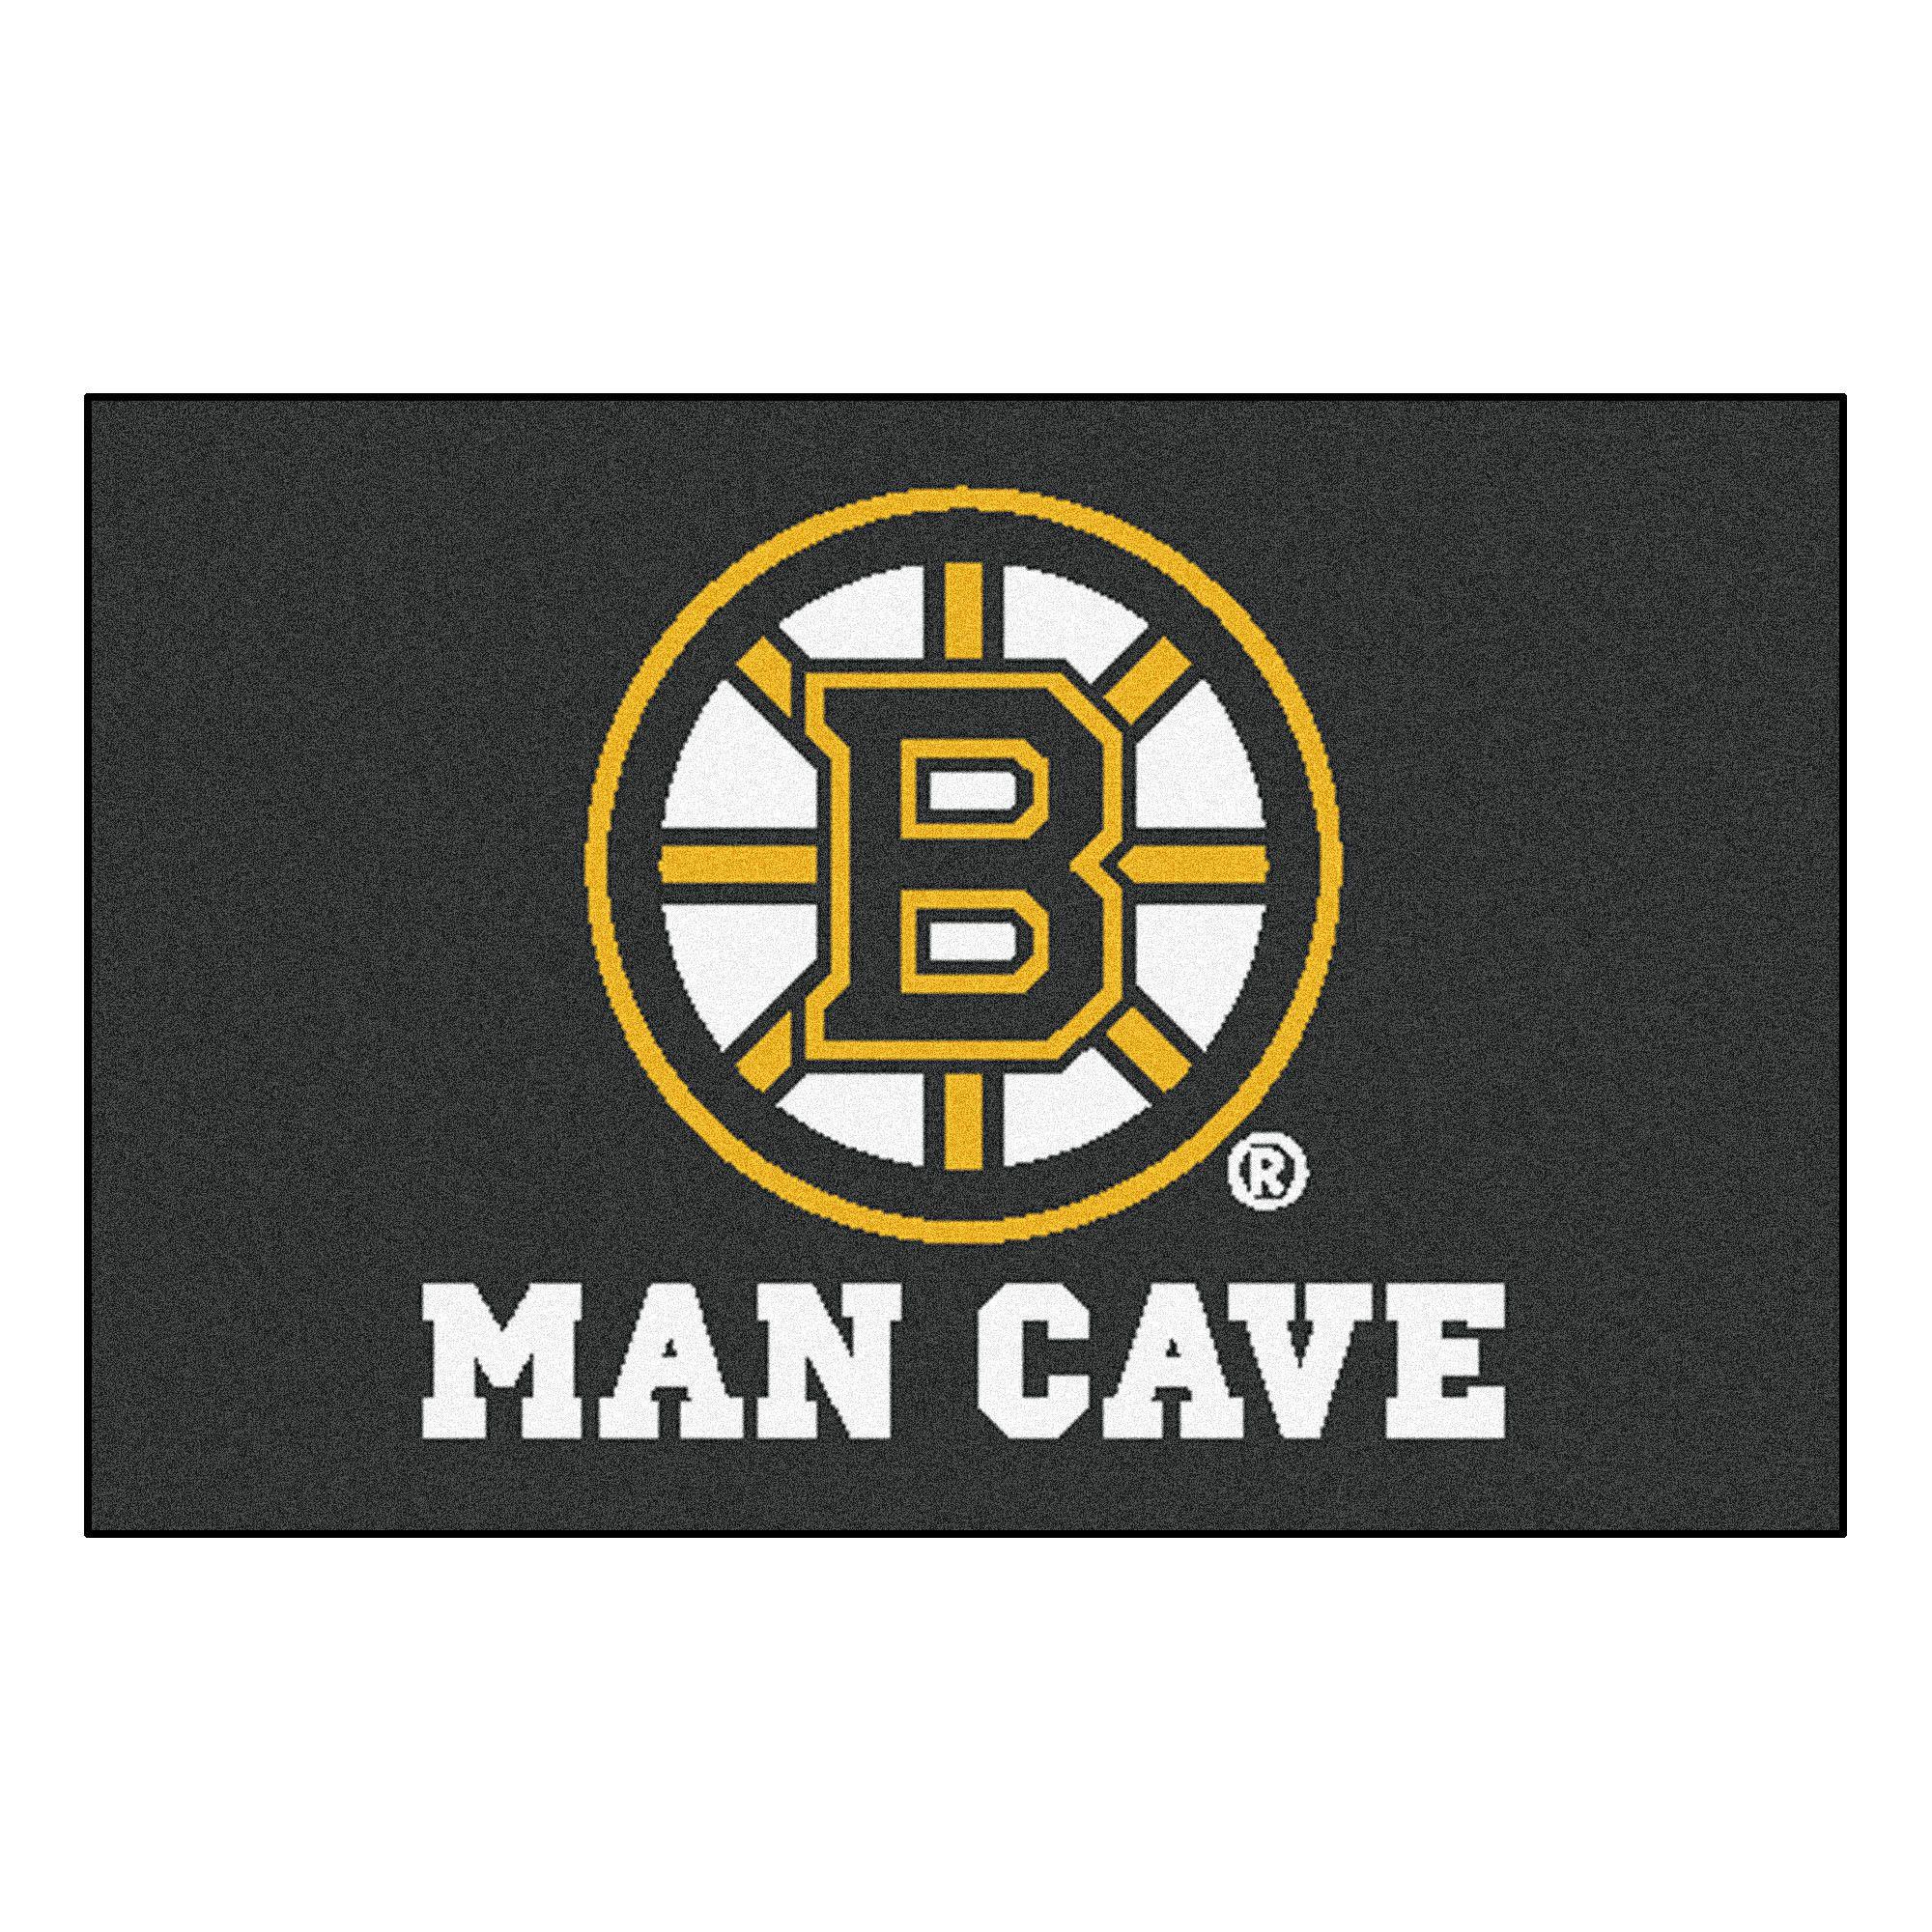 Boston Bruins Man Cave Starter Rug 19x30